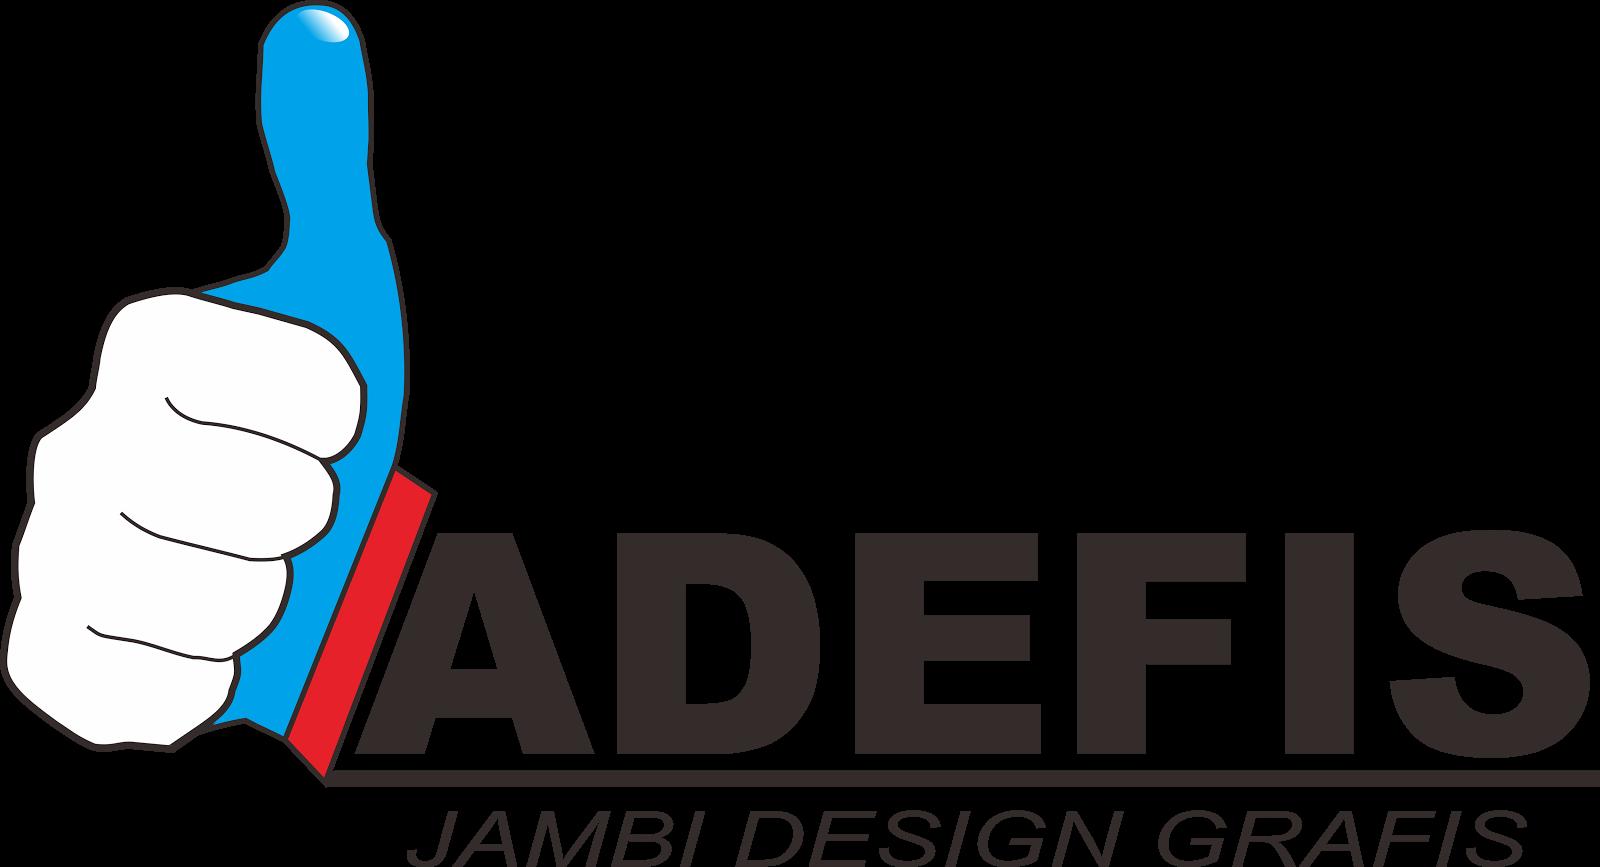 - JADEFIS - Jambi Design Grafis